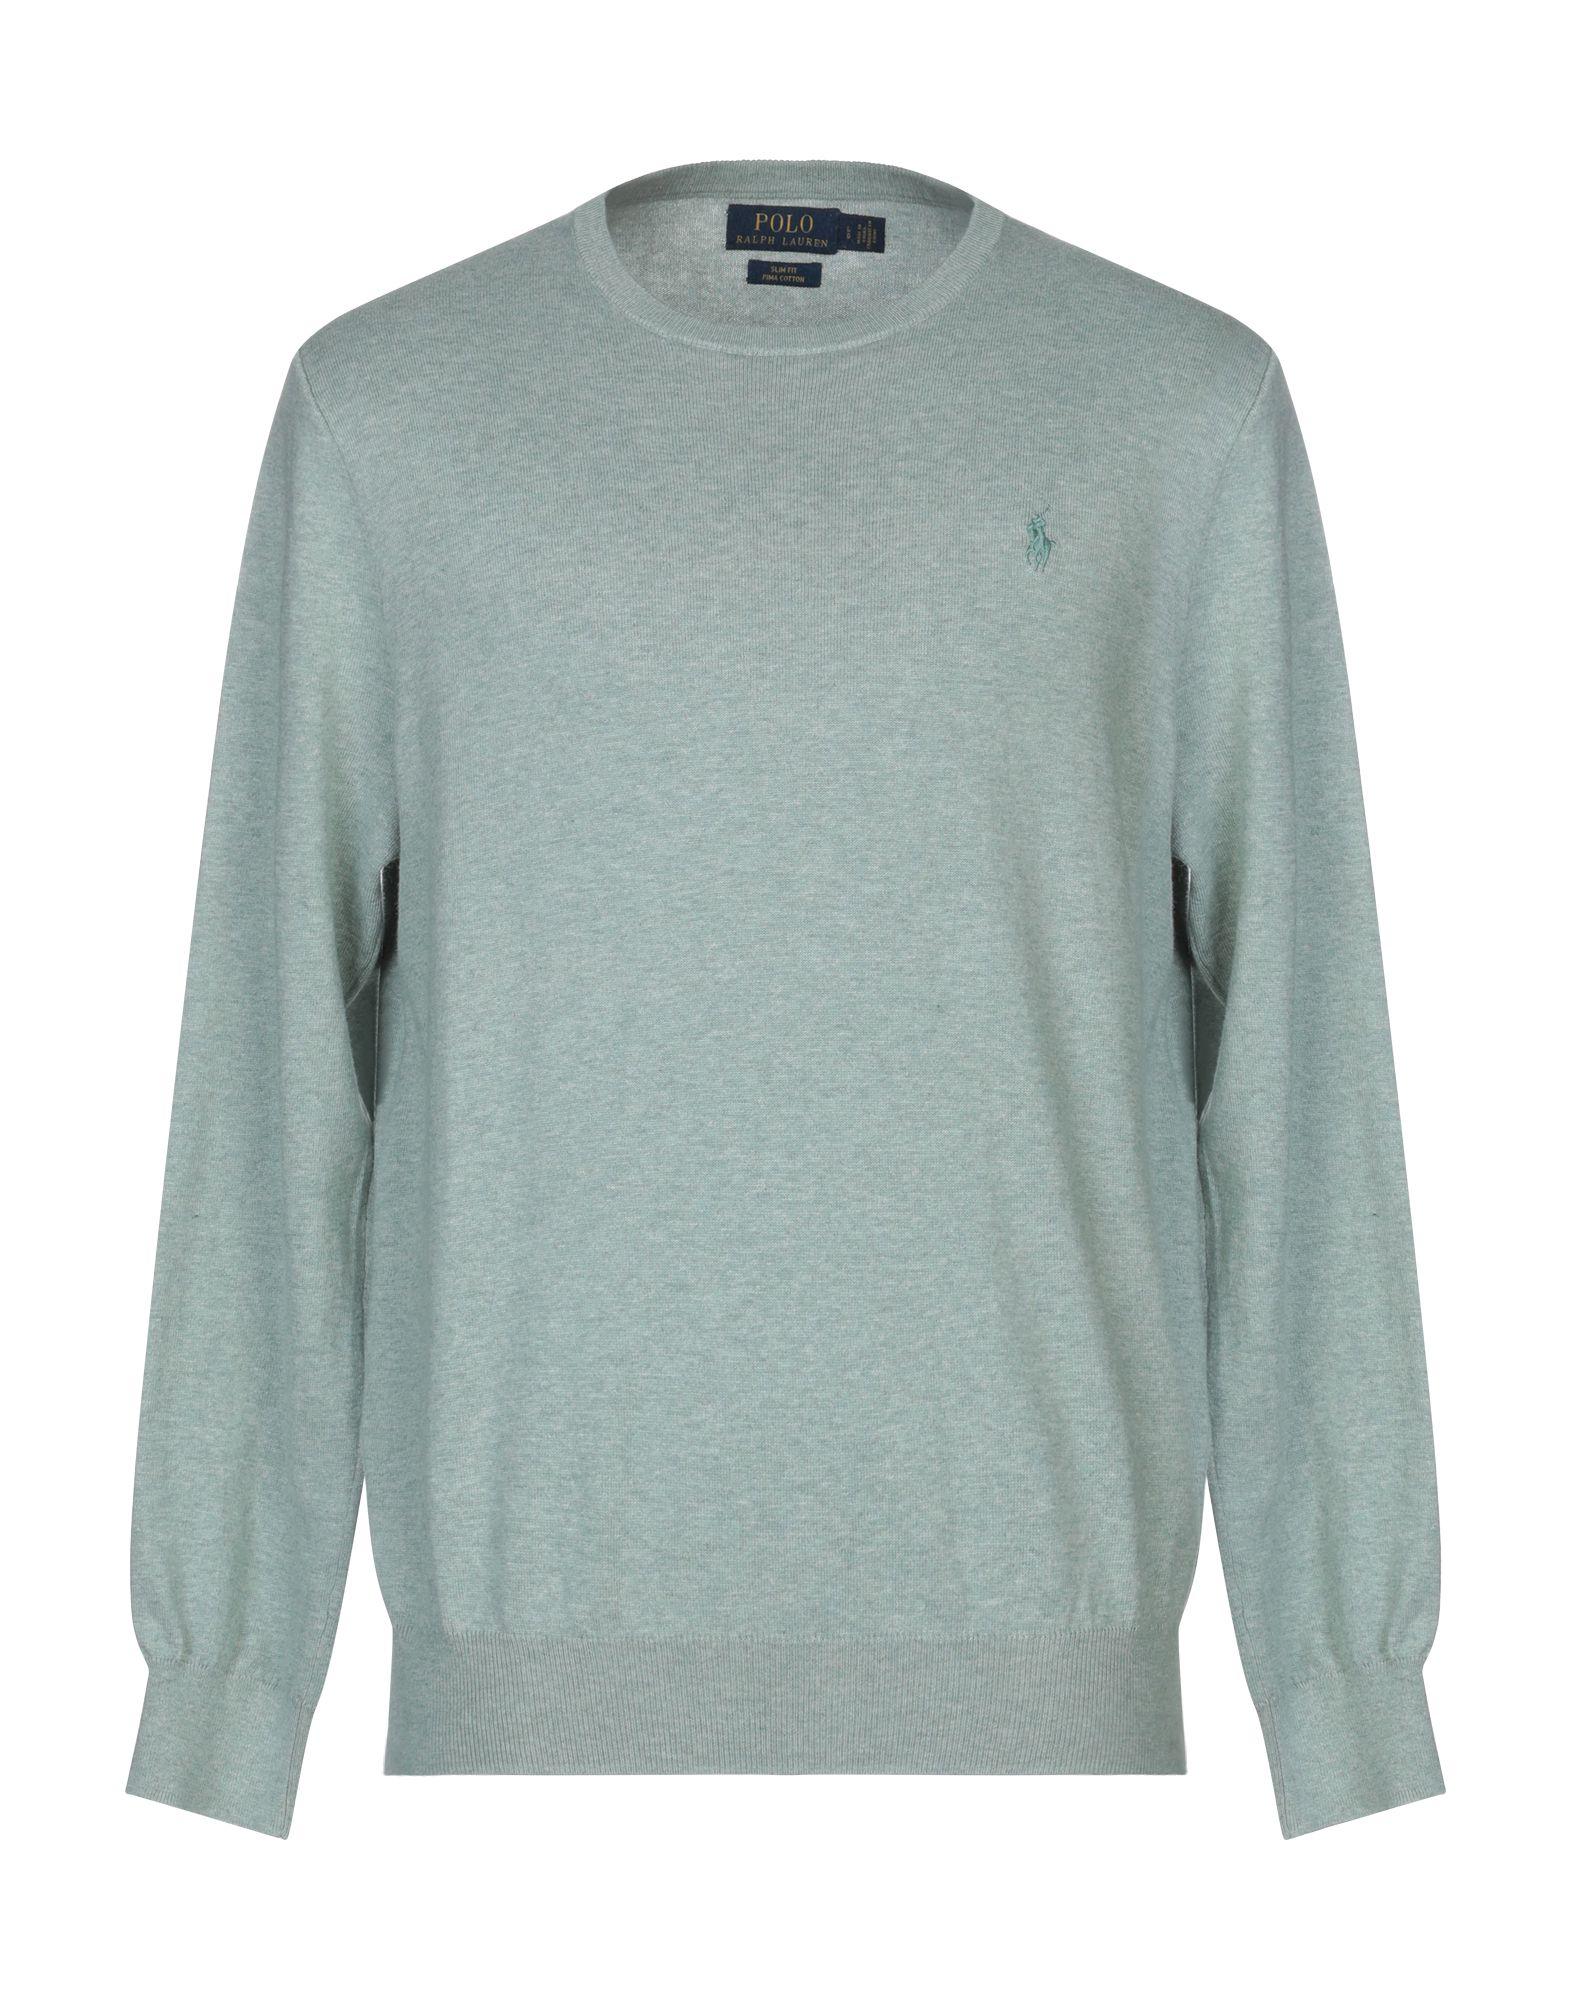 863cab4fa38 Ralph Lauren Homme - Pulls Et Sweat-Shirts Ralph Lauren - YOOX